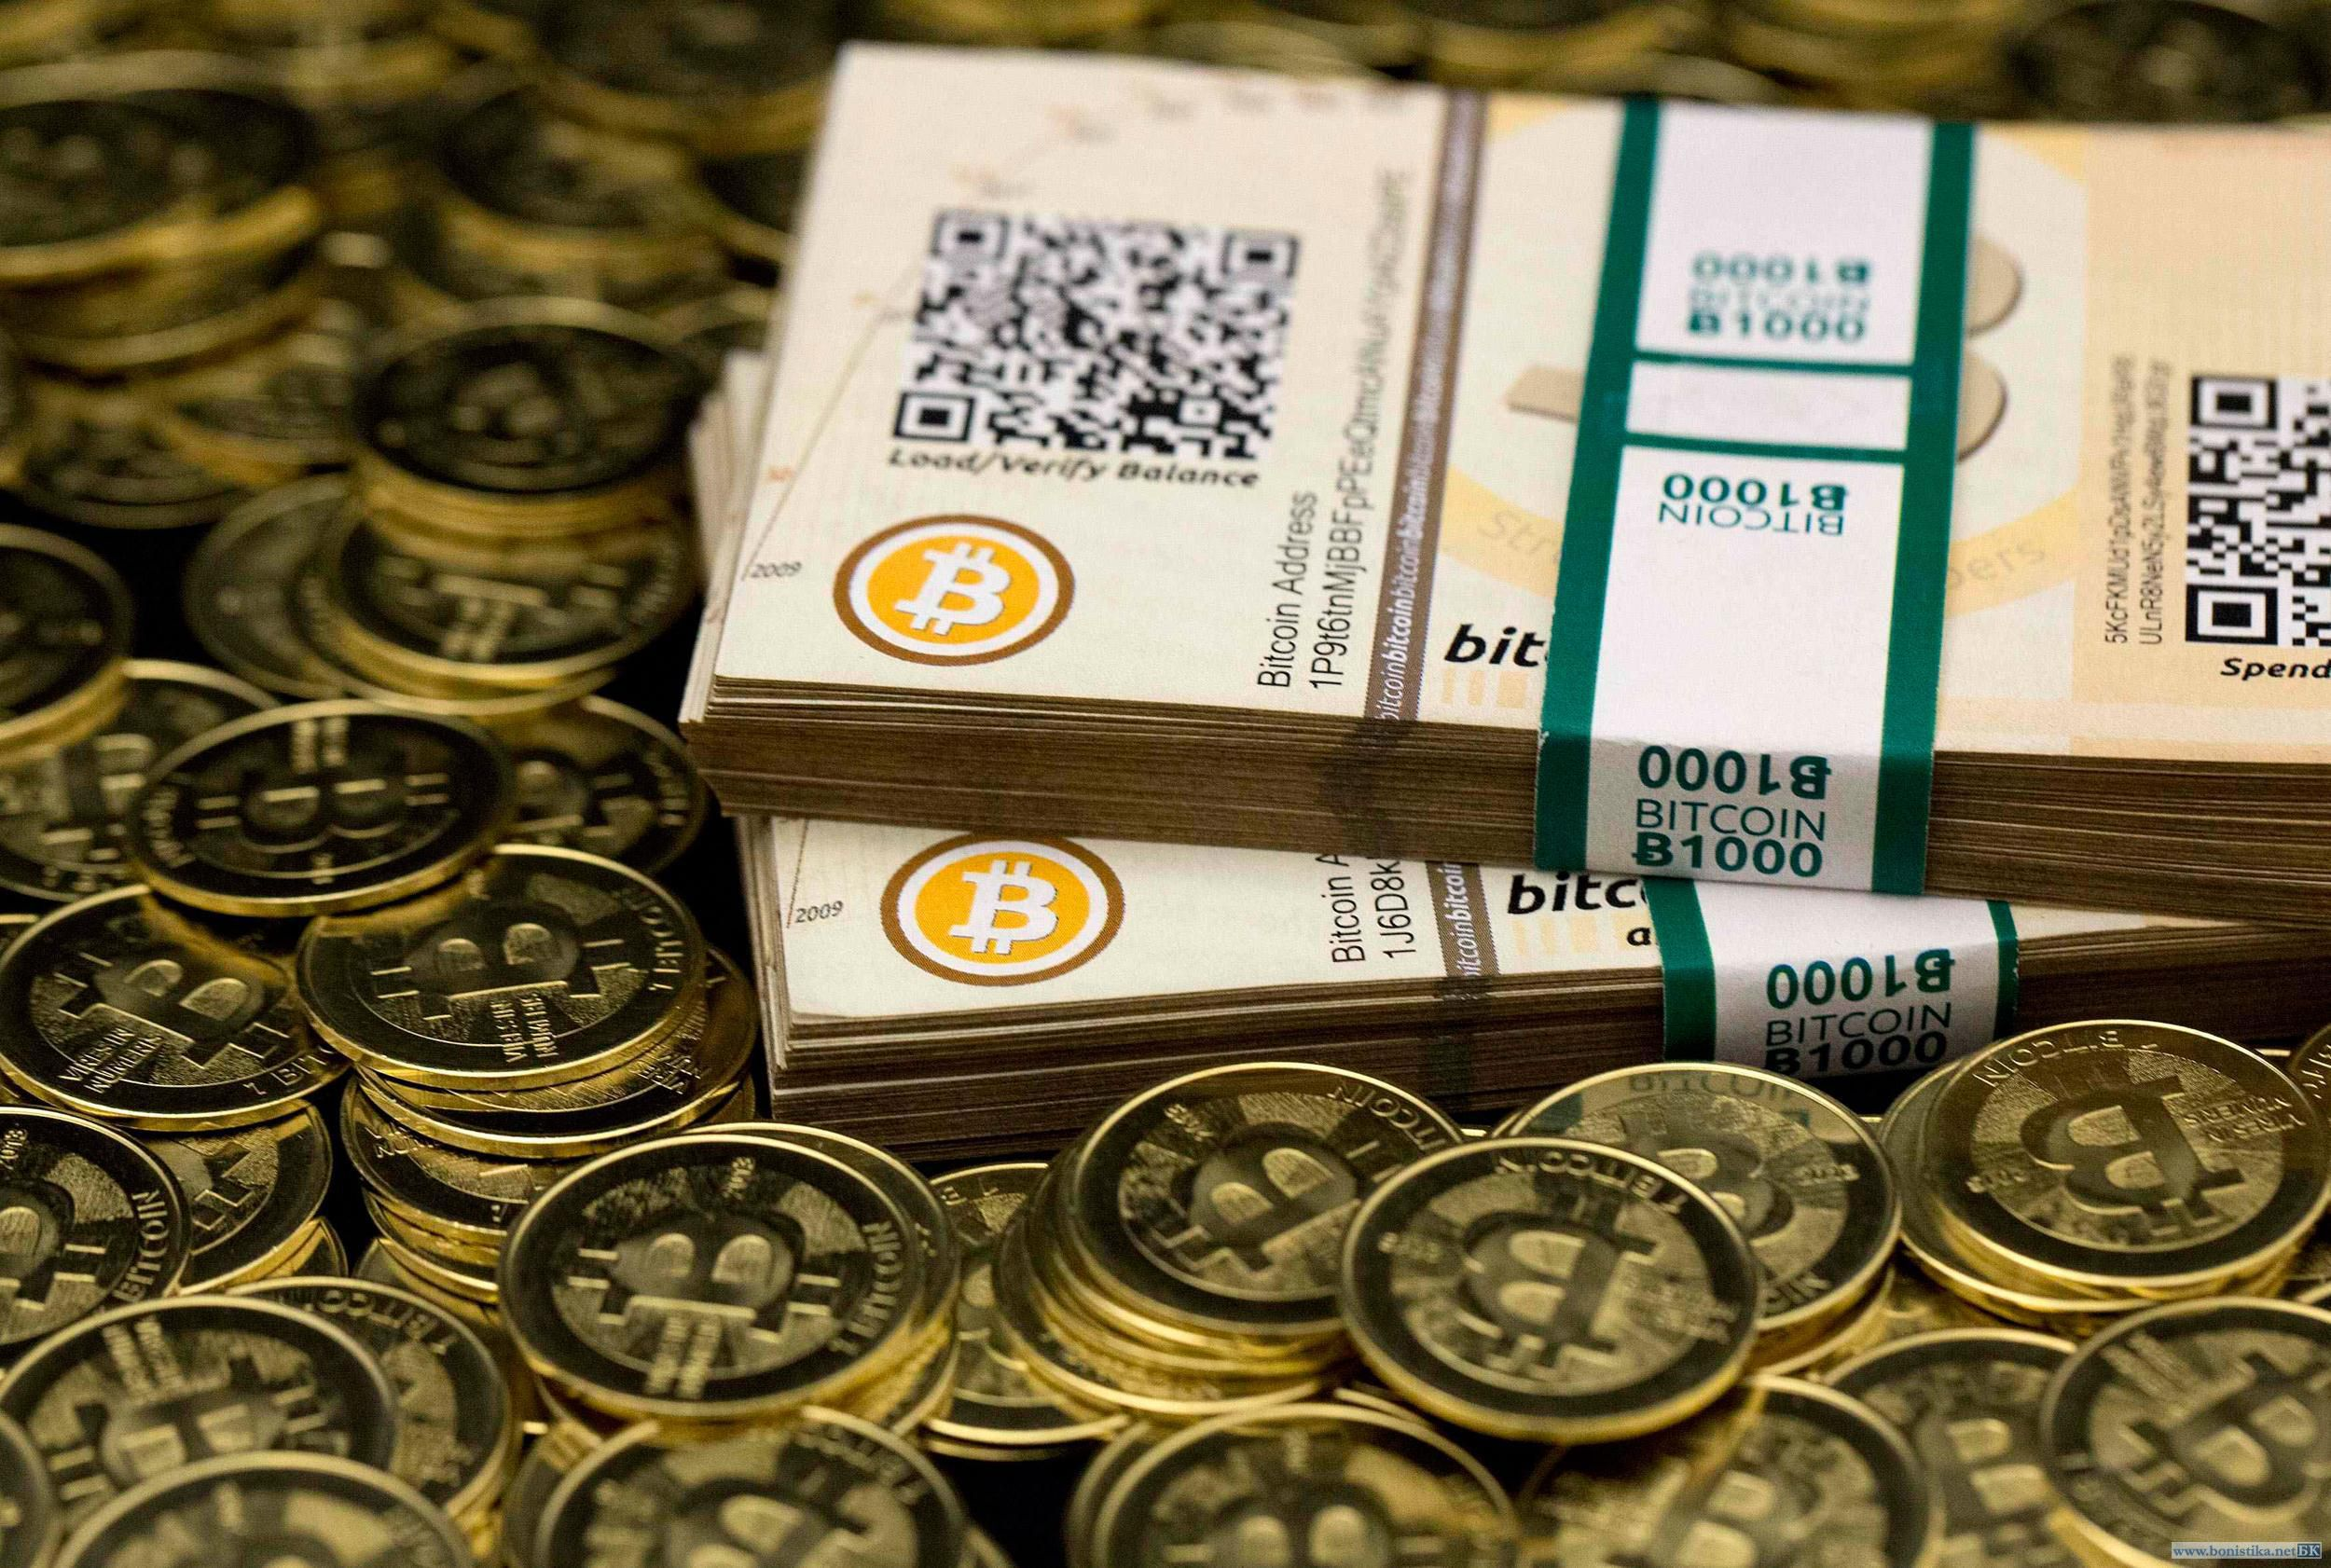 Bitcoin Banknotes and Coins Wallpaper Full HD